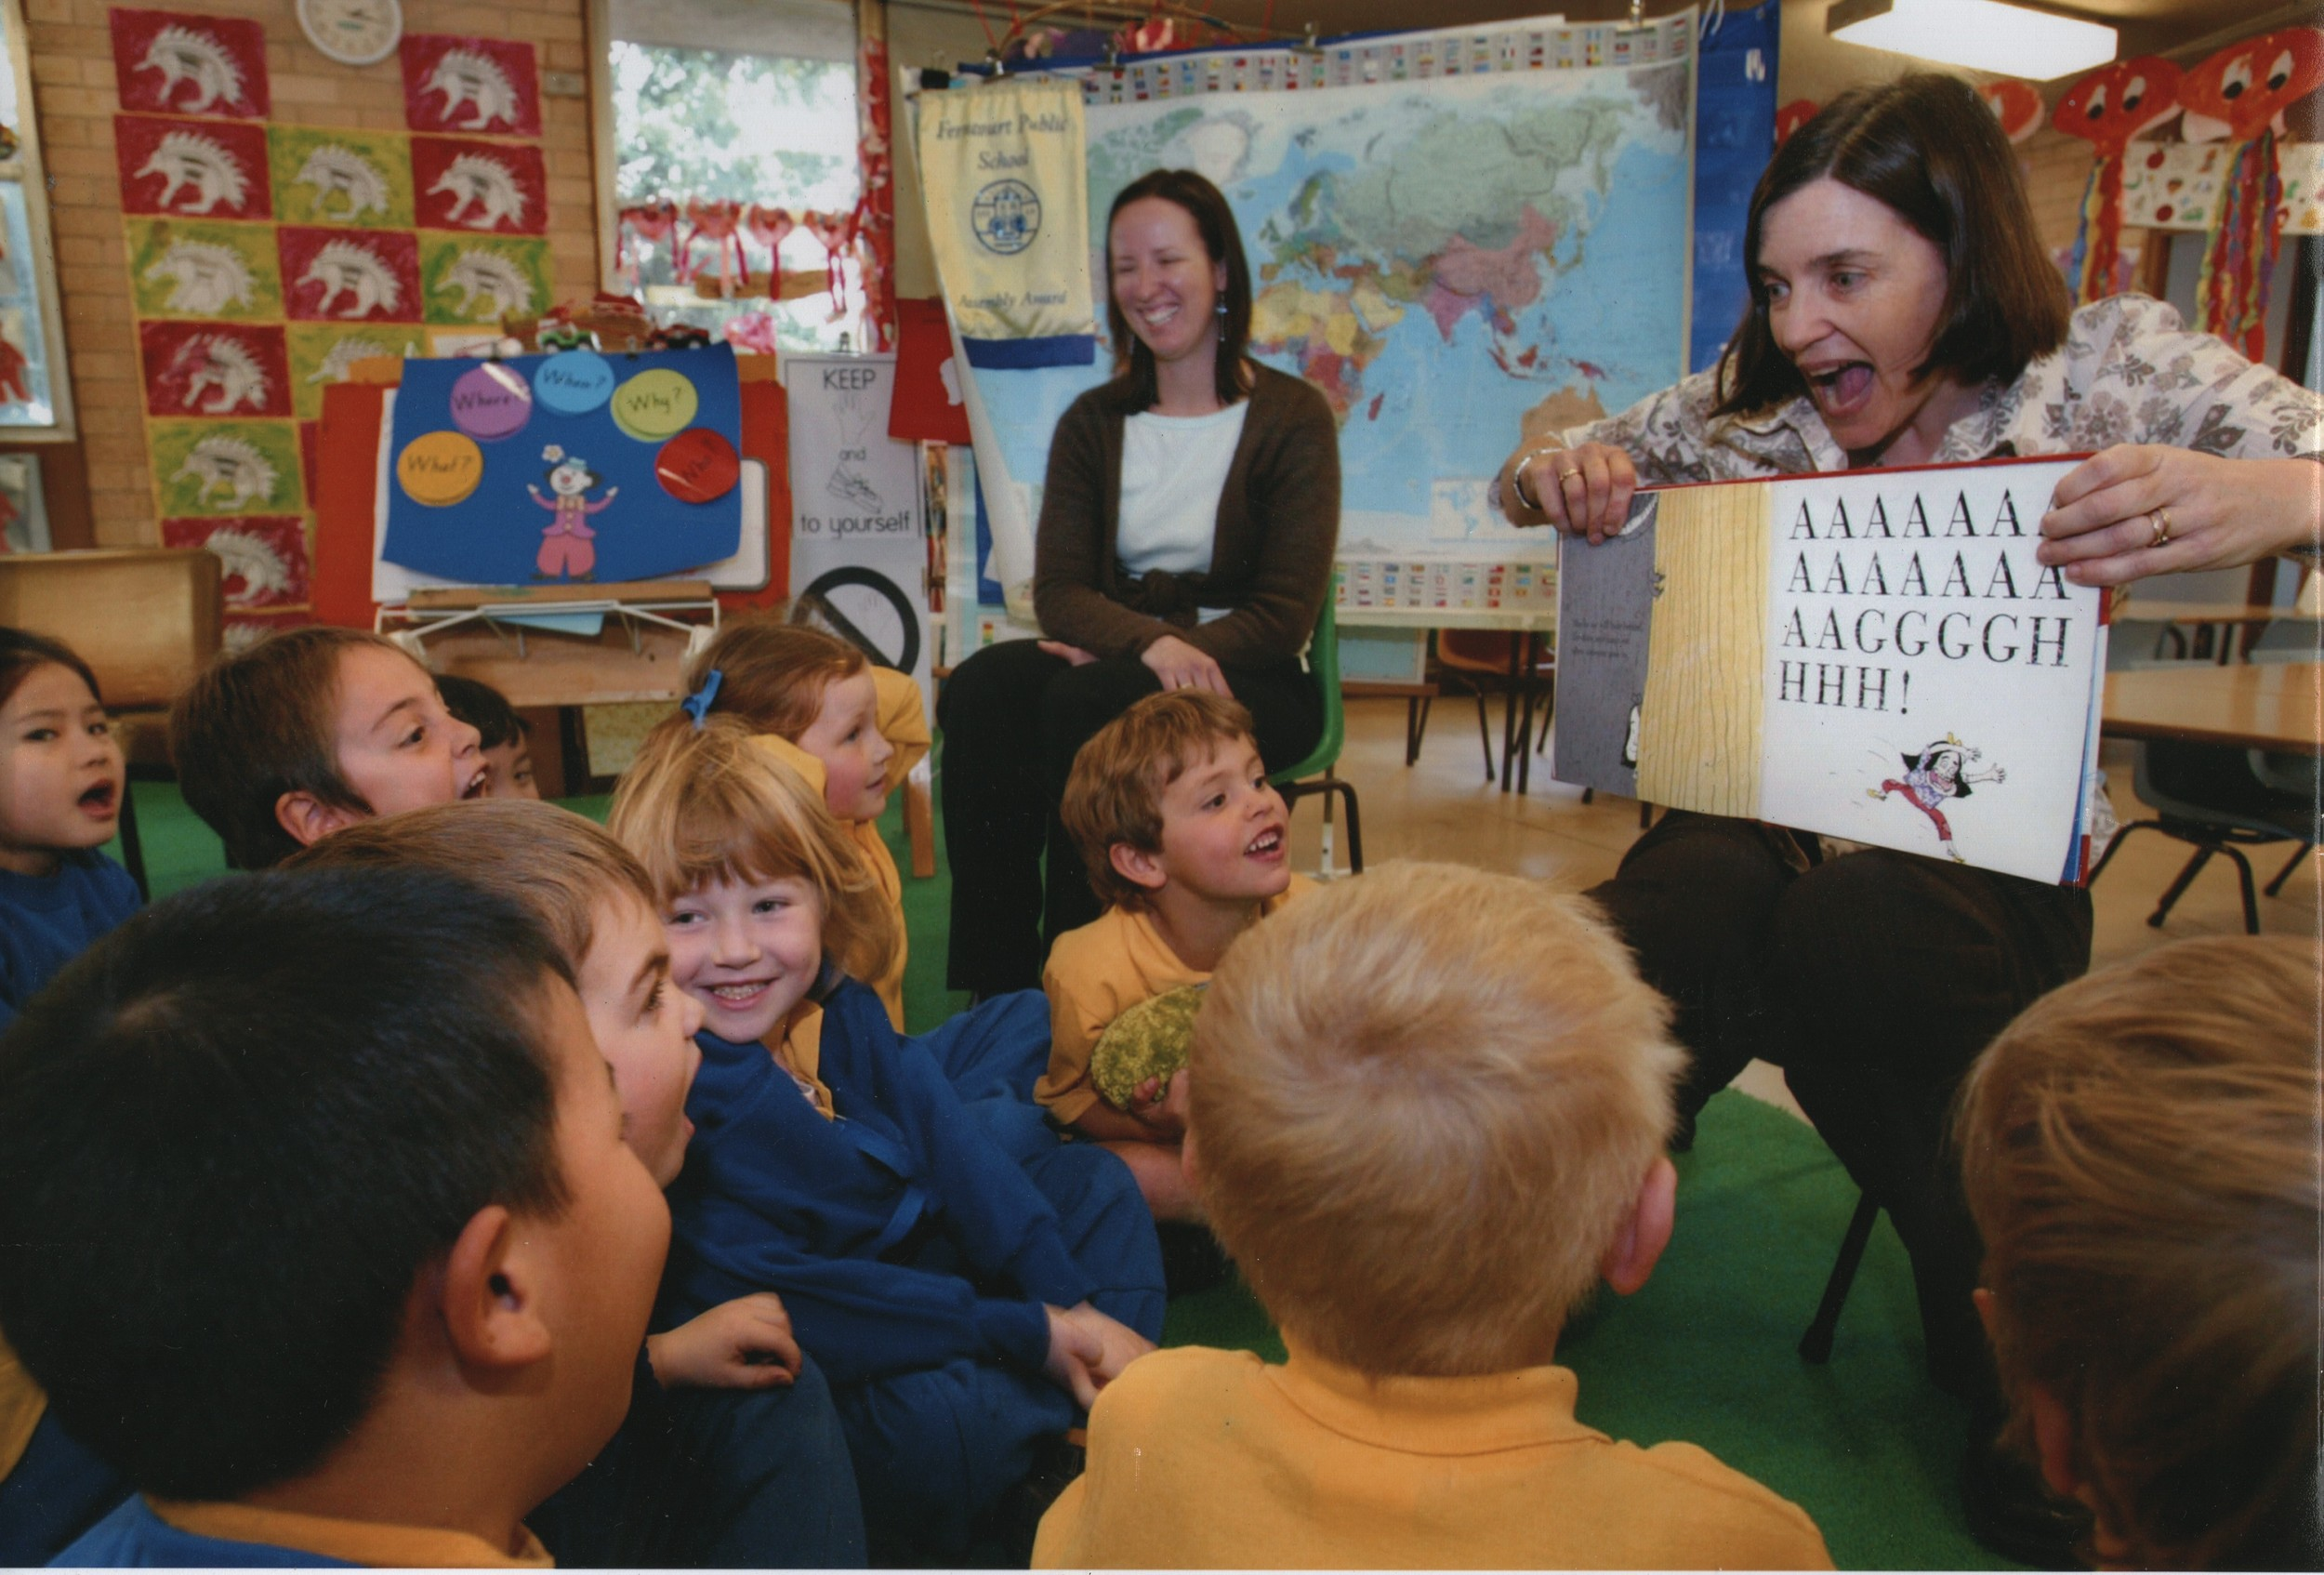 AT FERNCOURT PUBLIC SCHOOL, READING 'REX' 2005.